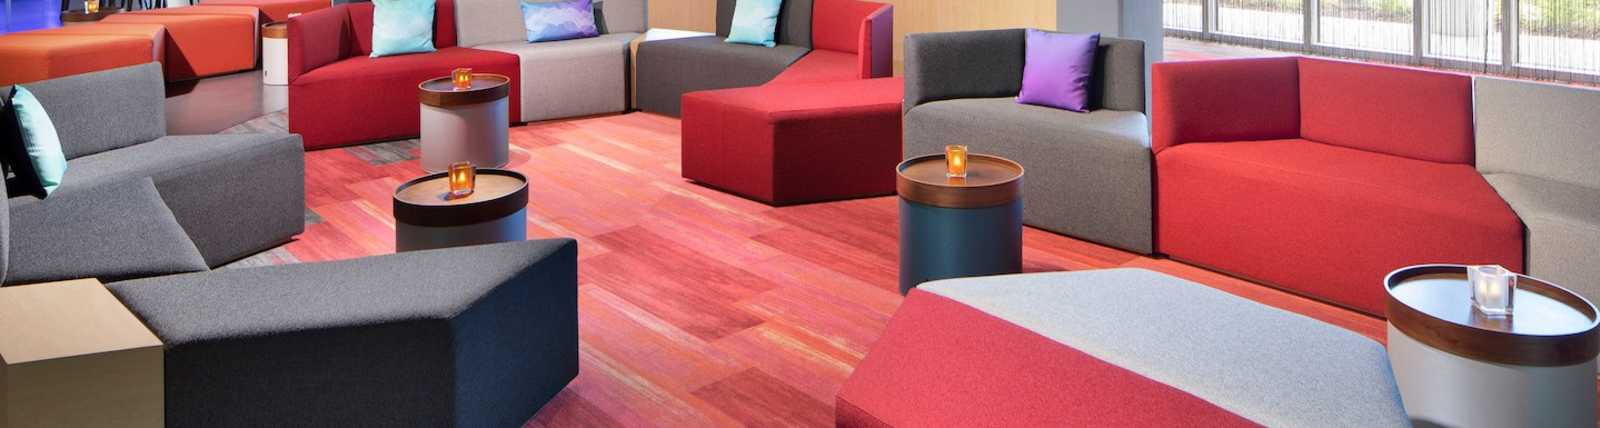 Aloft Lounge